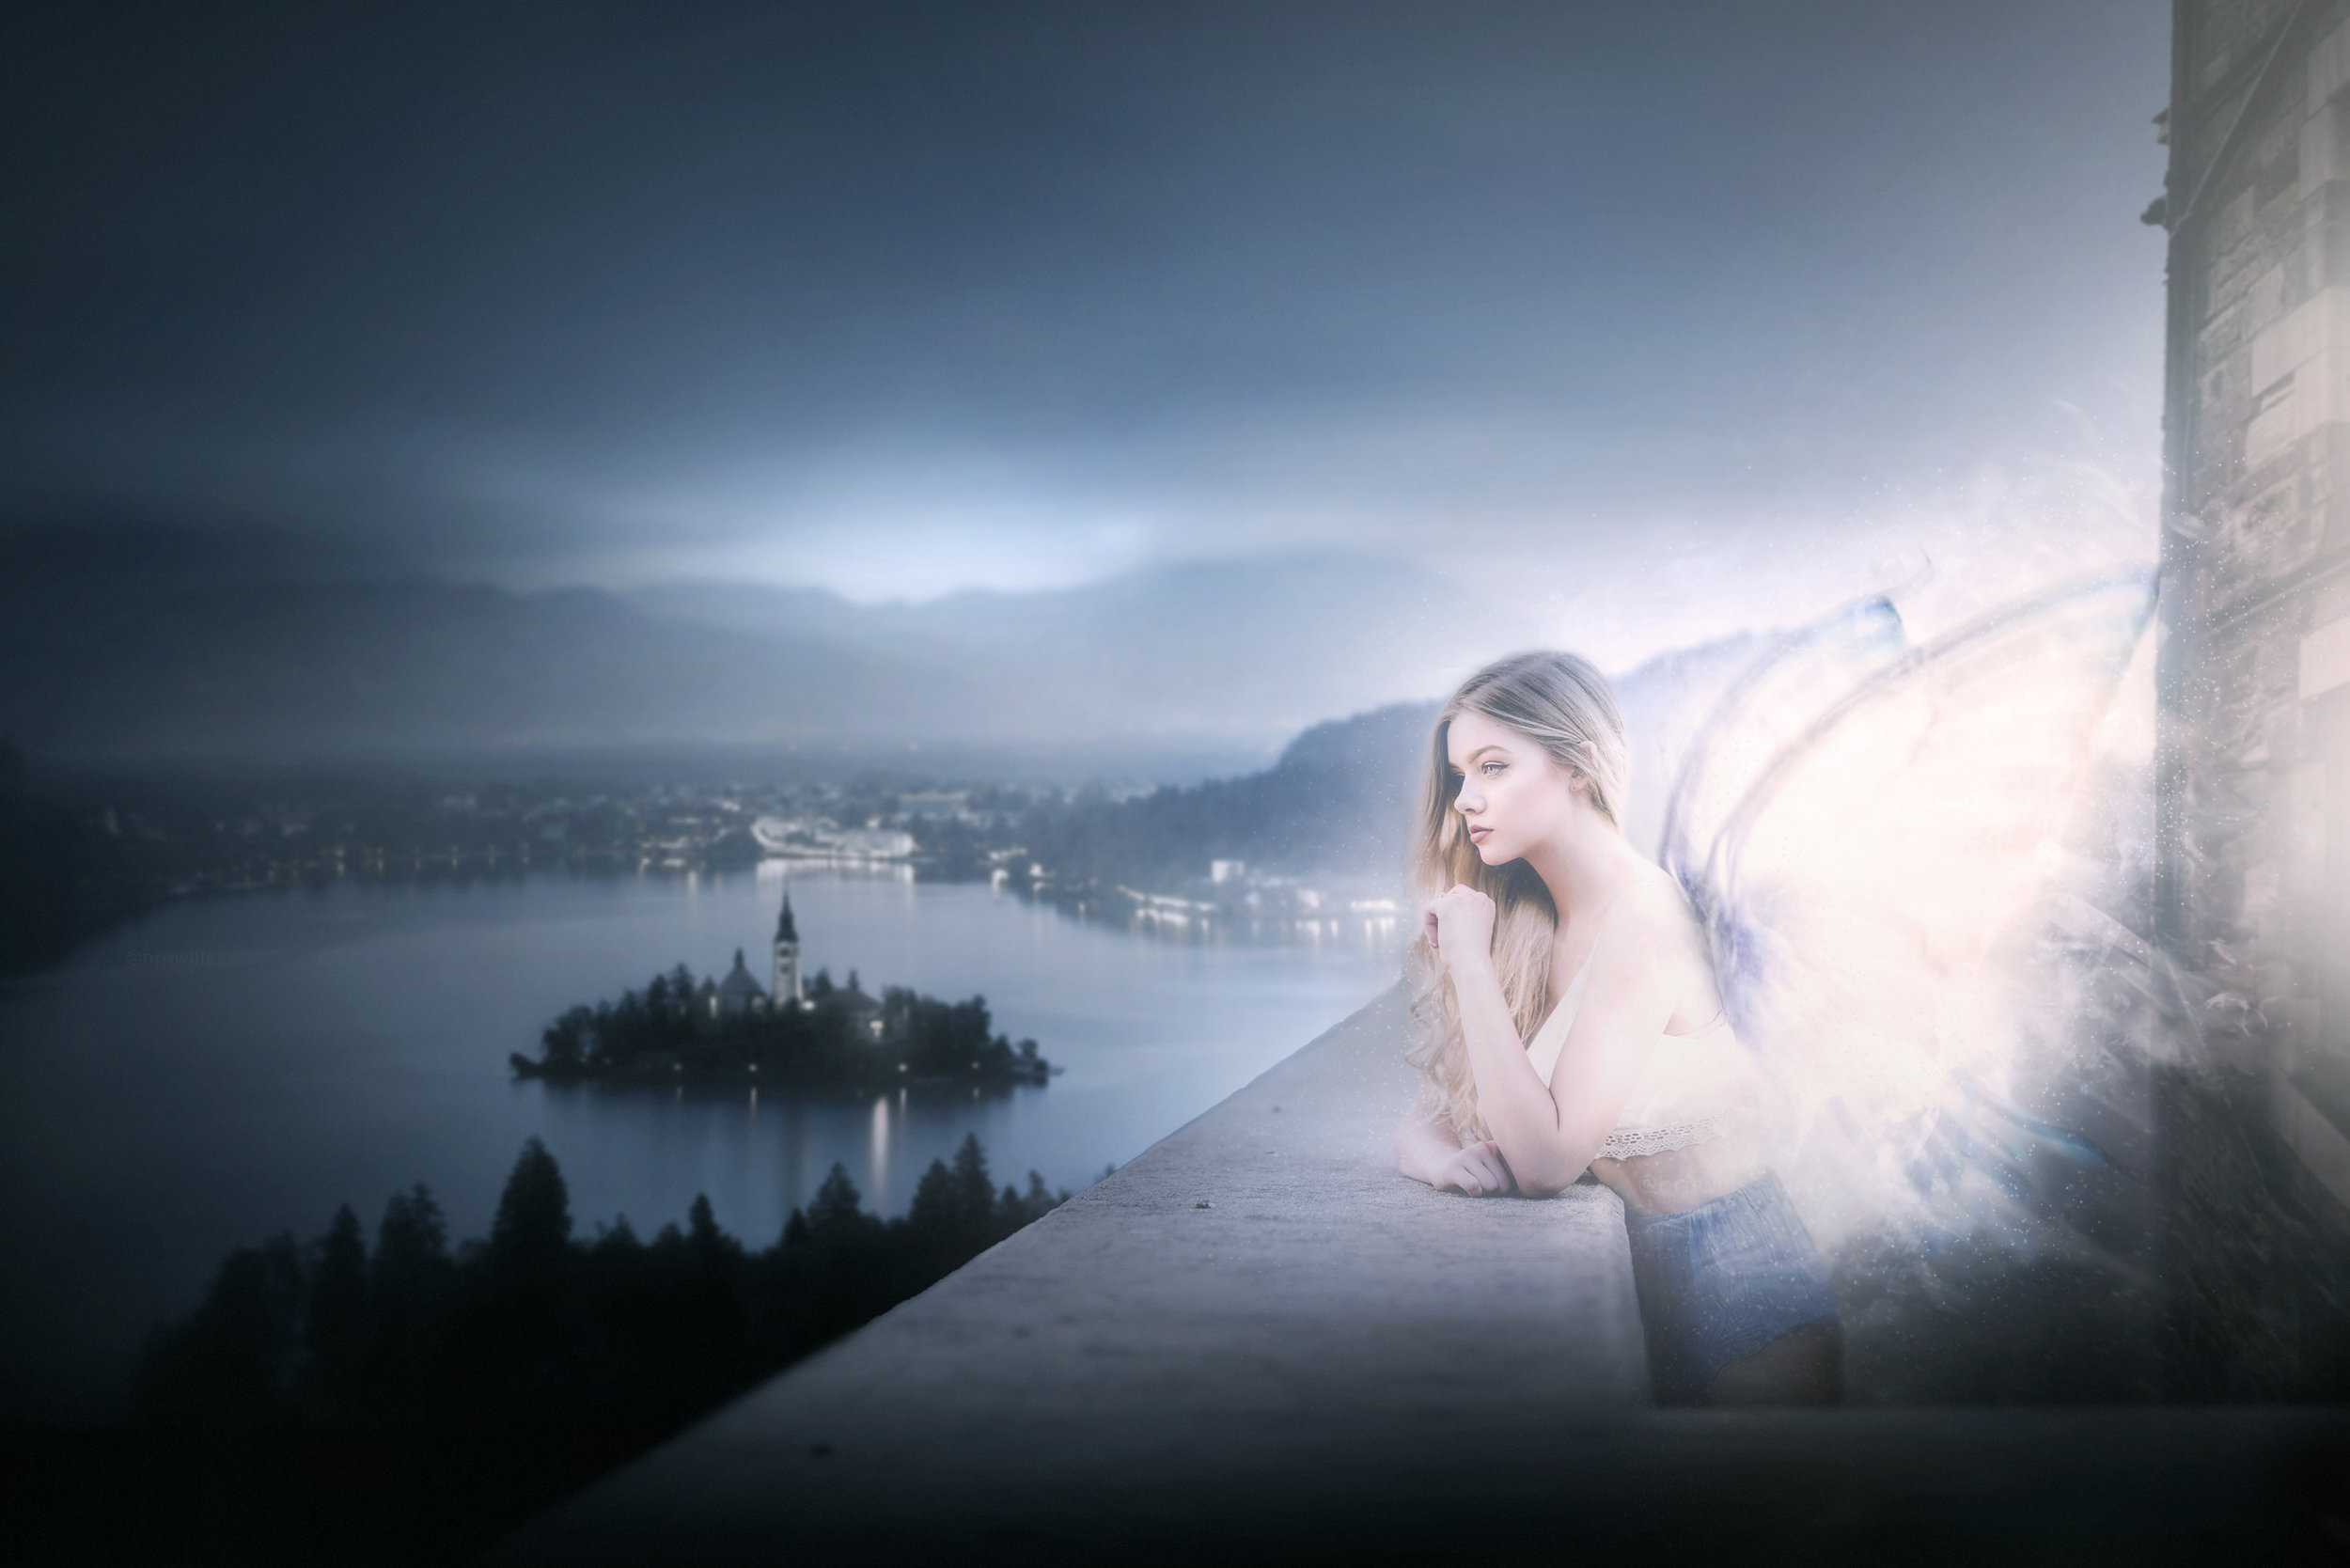 FairyKingdomEDITWATERMARK.jpg